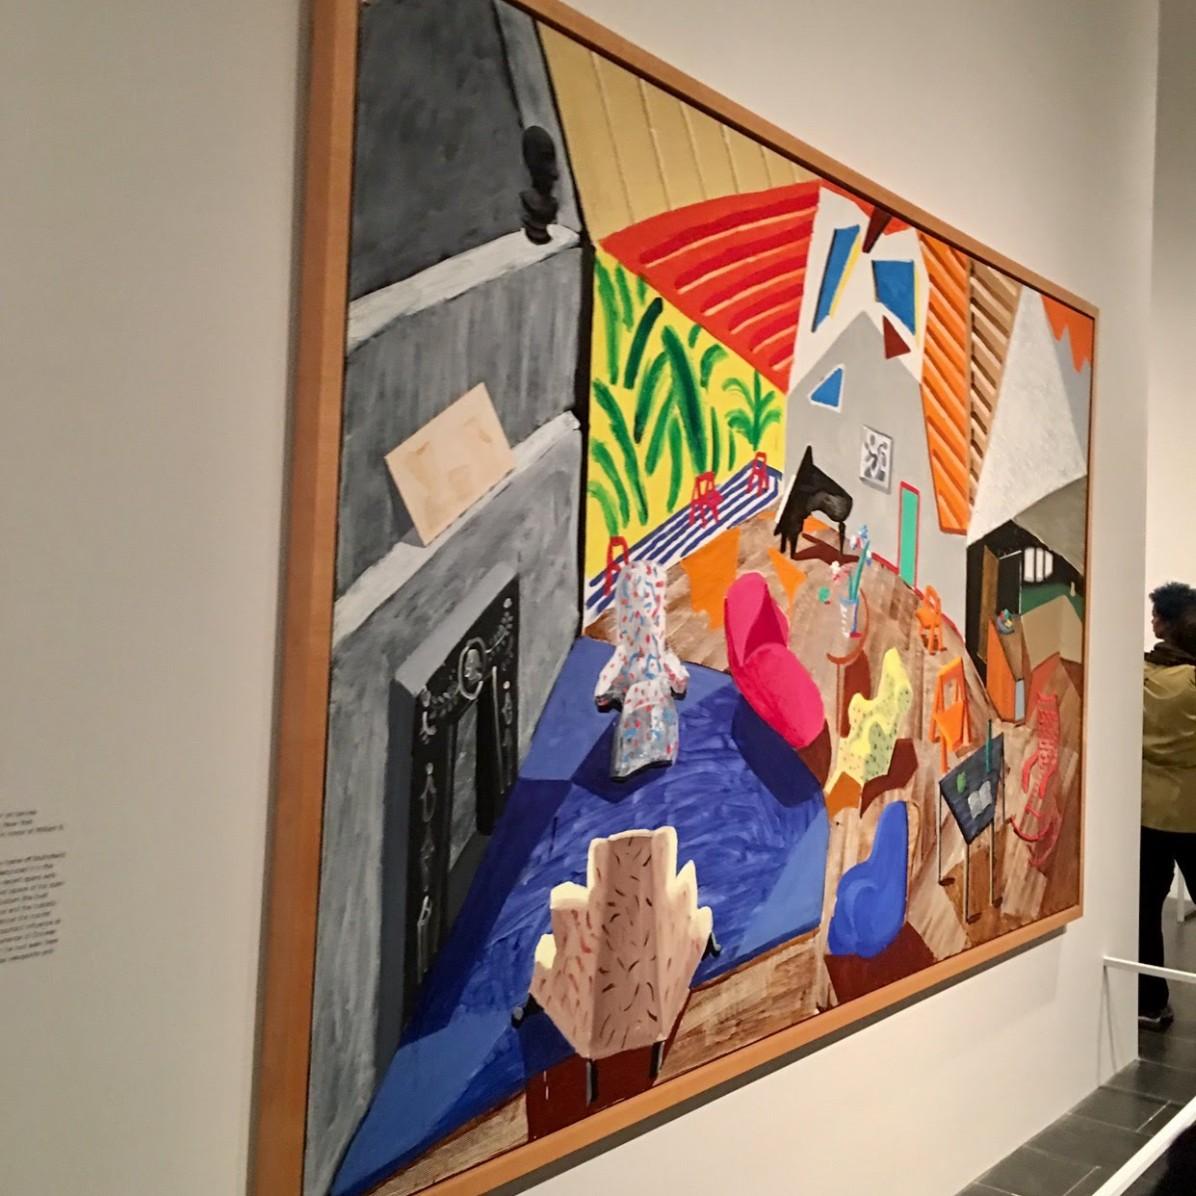 David Hockney exhibit.. lots of great energy!